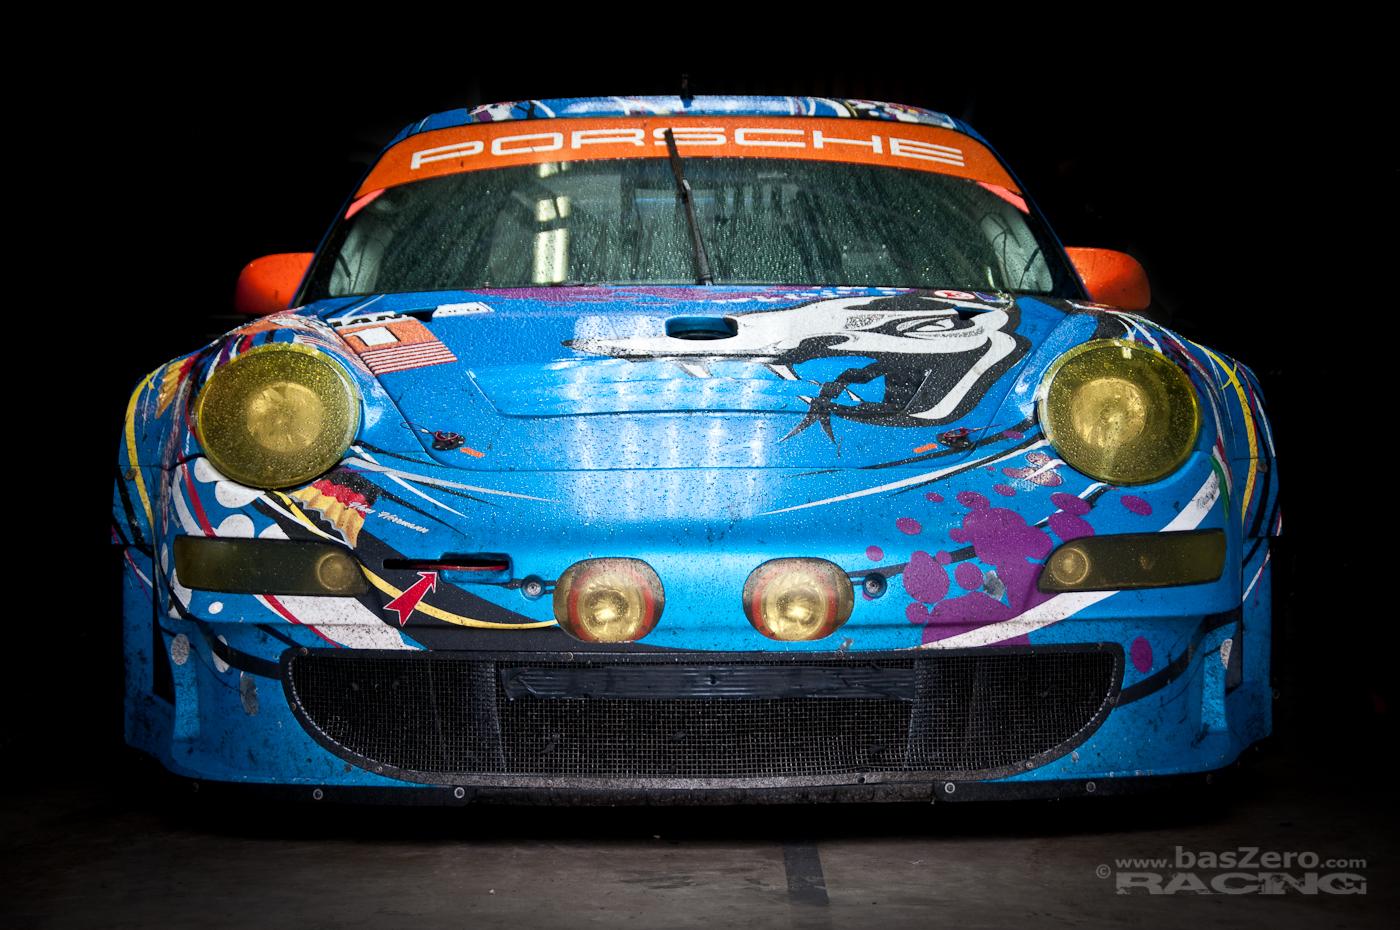 Ausgeschwitzt! Fotografiert in der Flying Lizard Boxengasse, Le Mans 2011